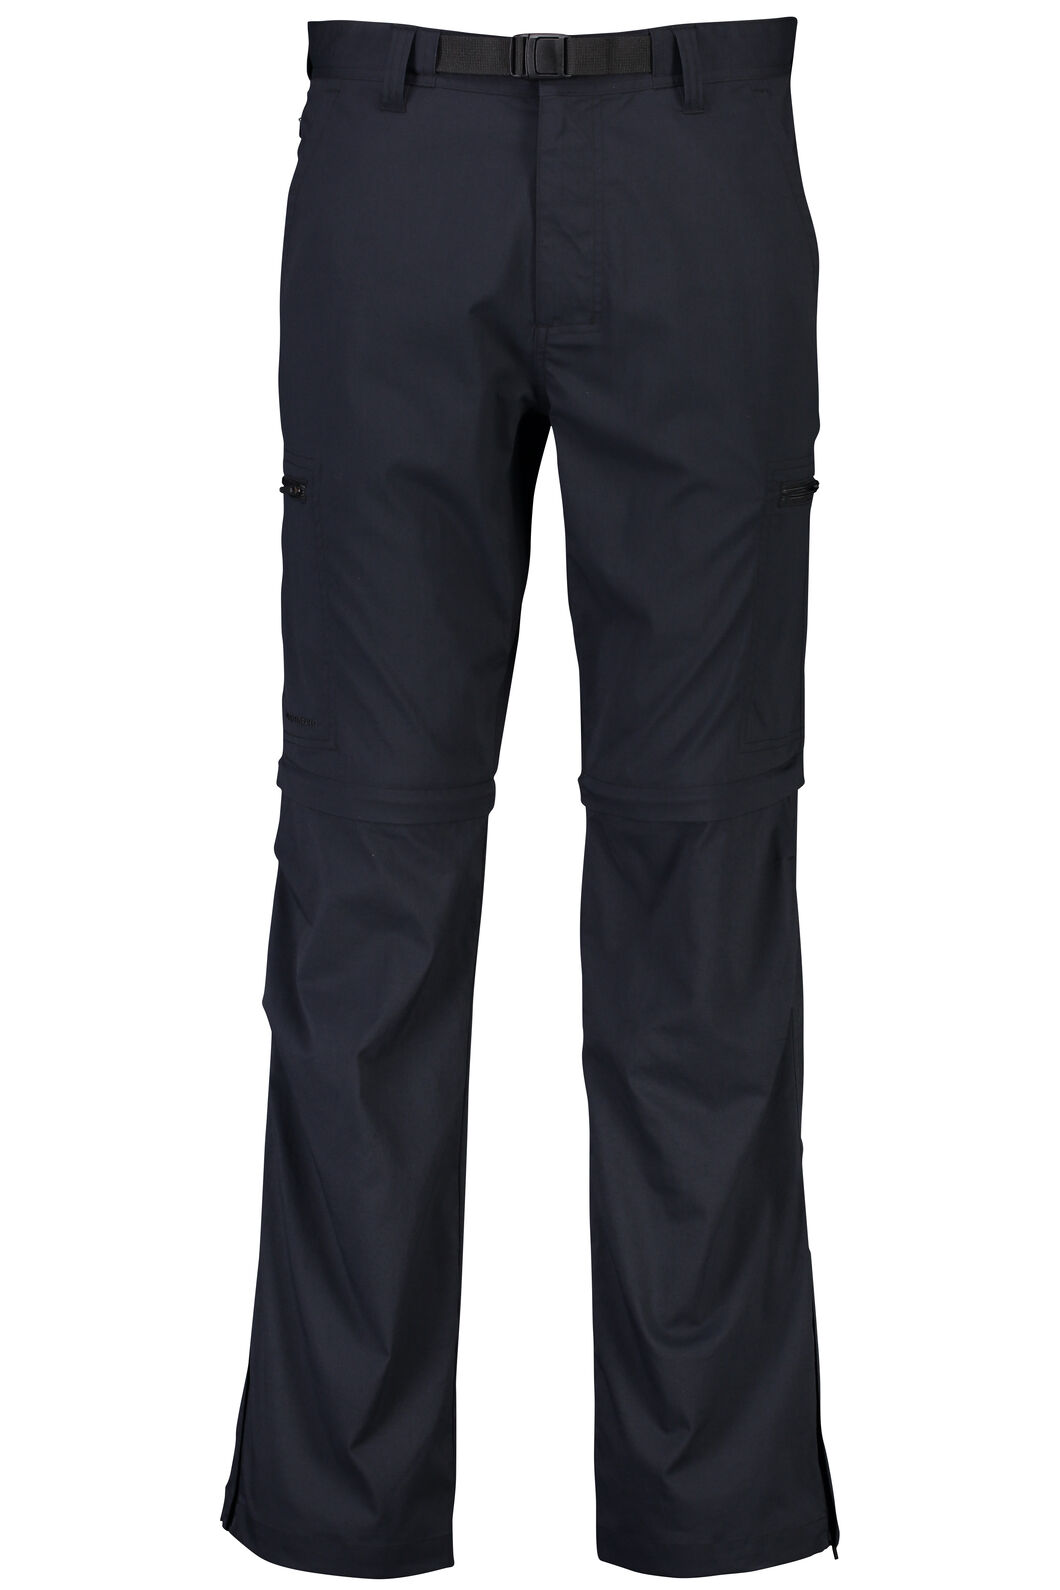 Macpac Rockover Convertible Pants - Men's, Black, hi-res